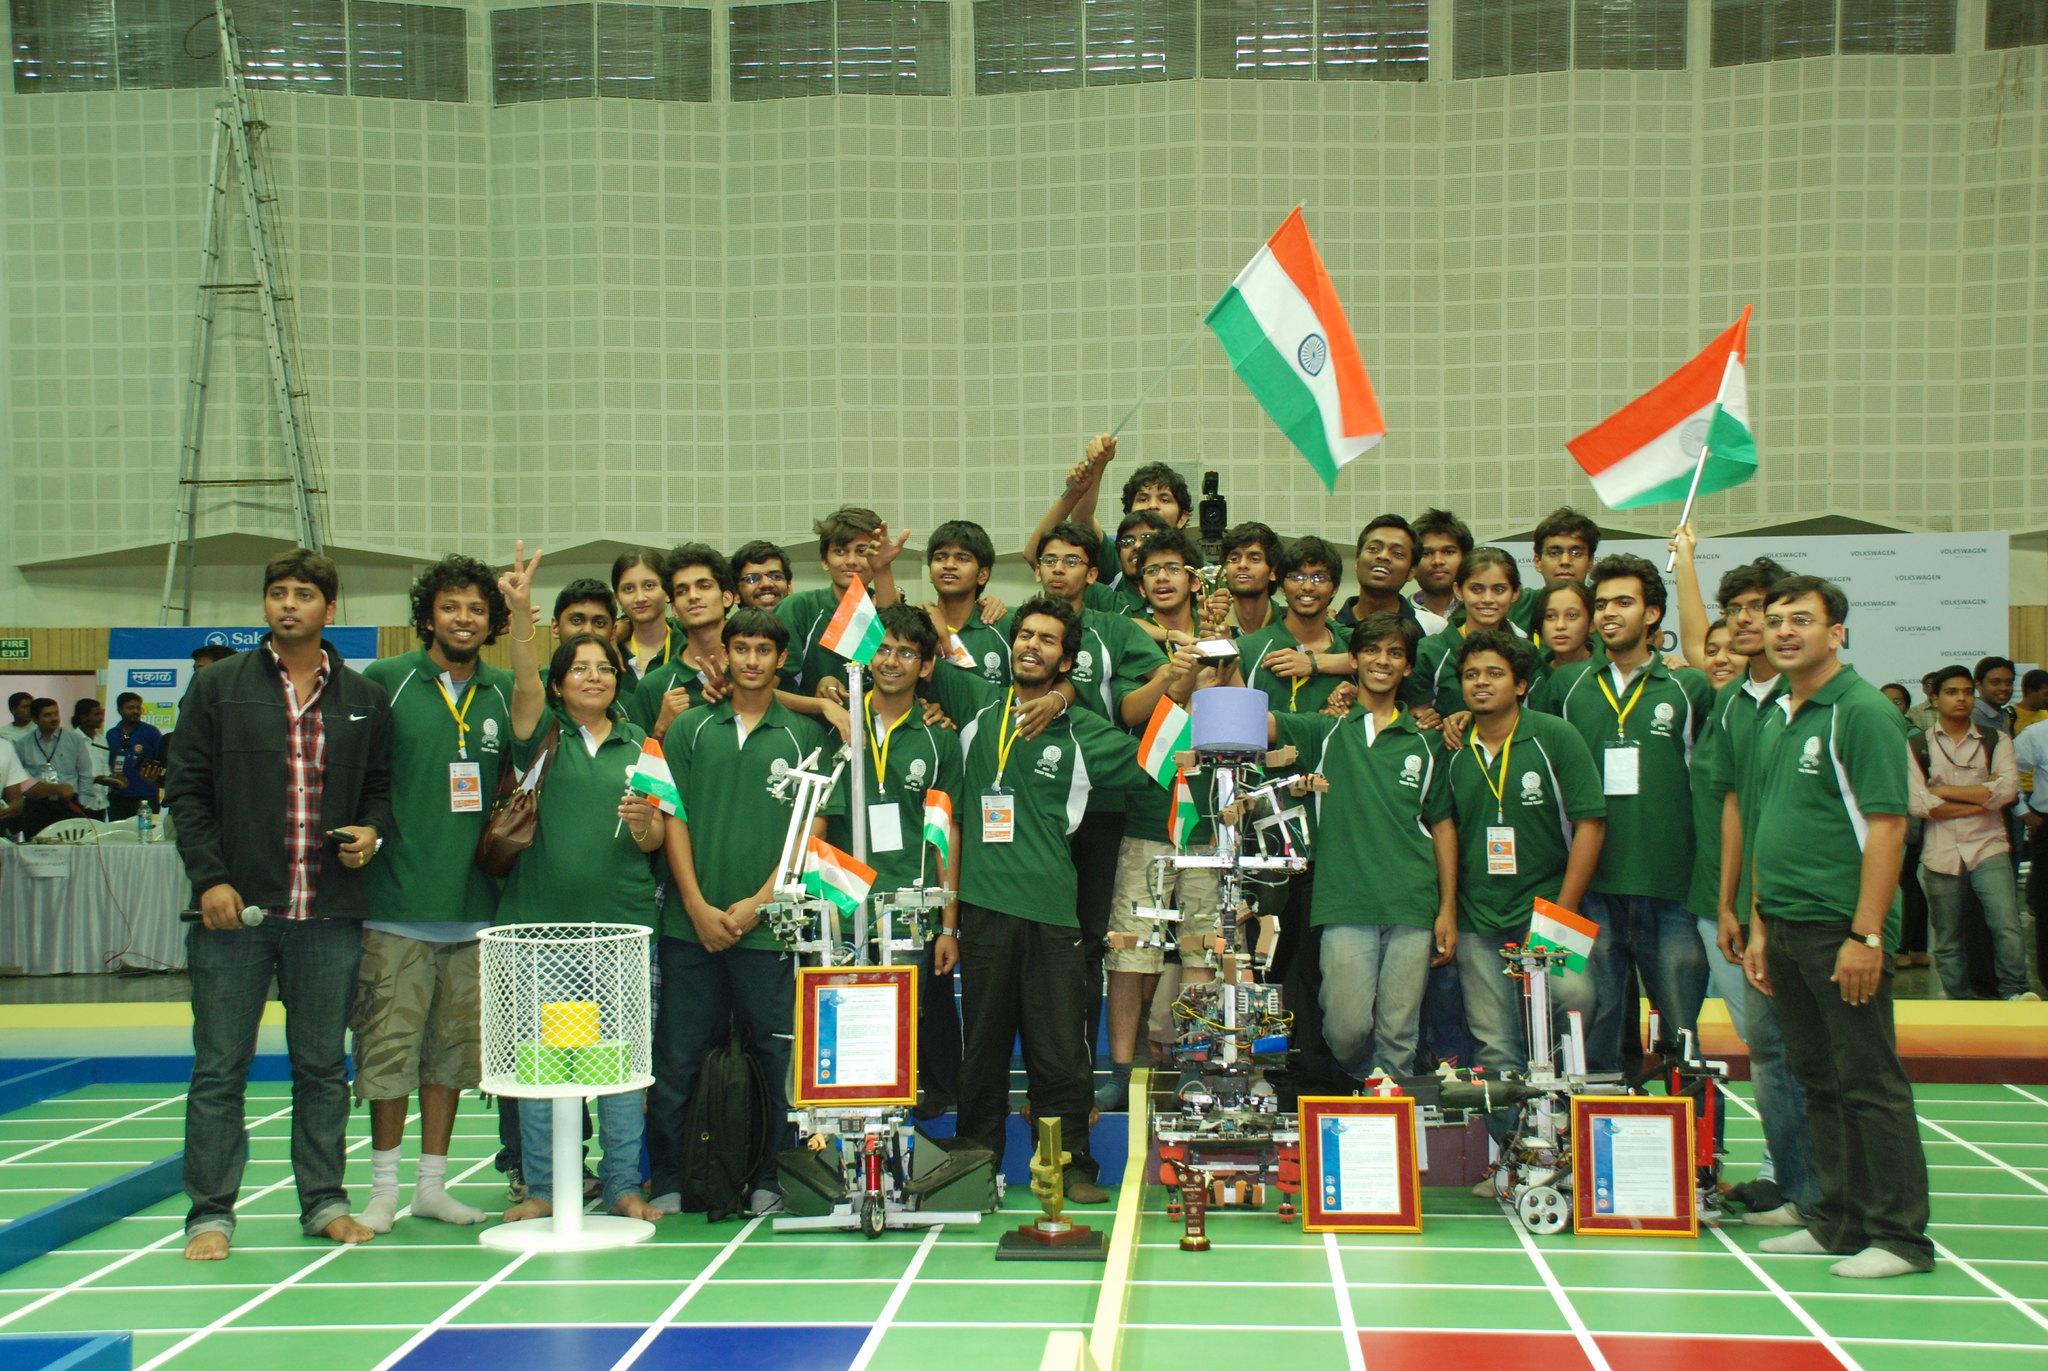 Robocon 2012 MIT Tech Team Pune: winning moment